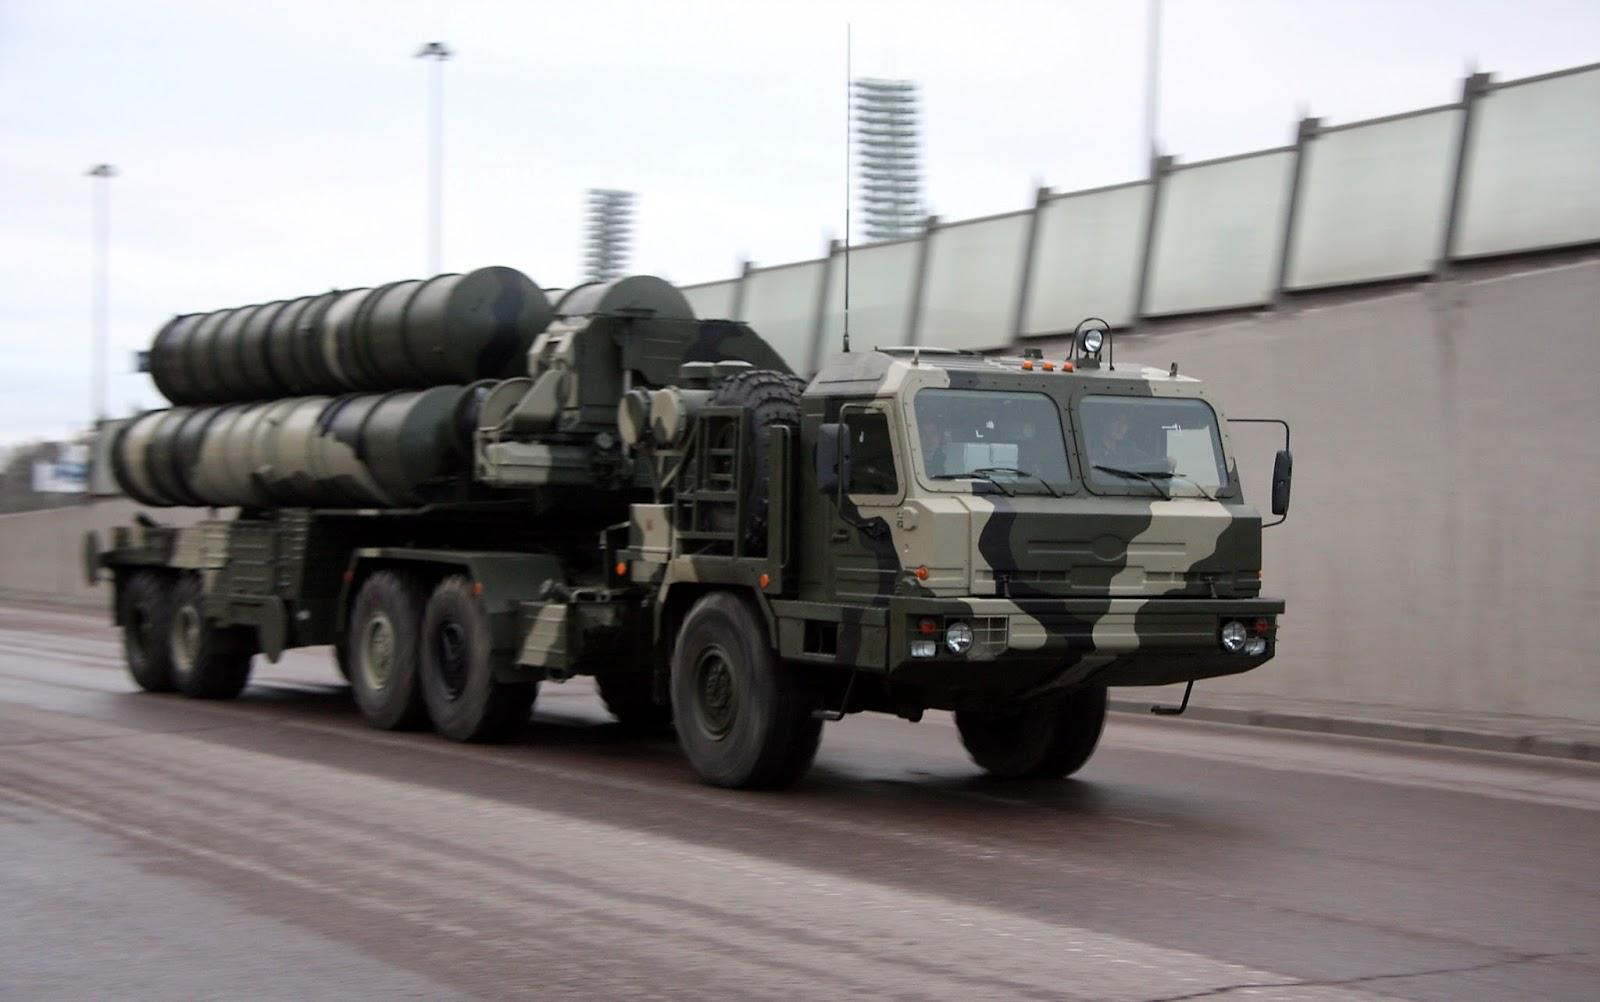 S-400 Triumf SAM System